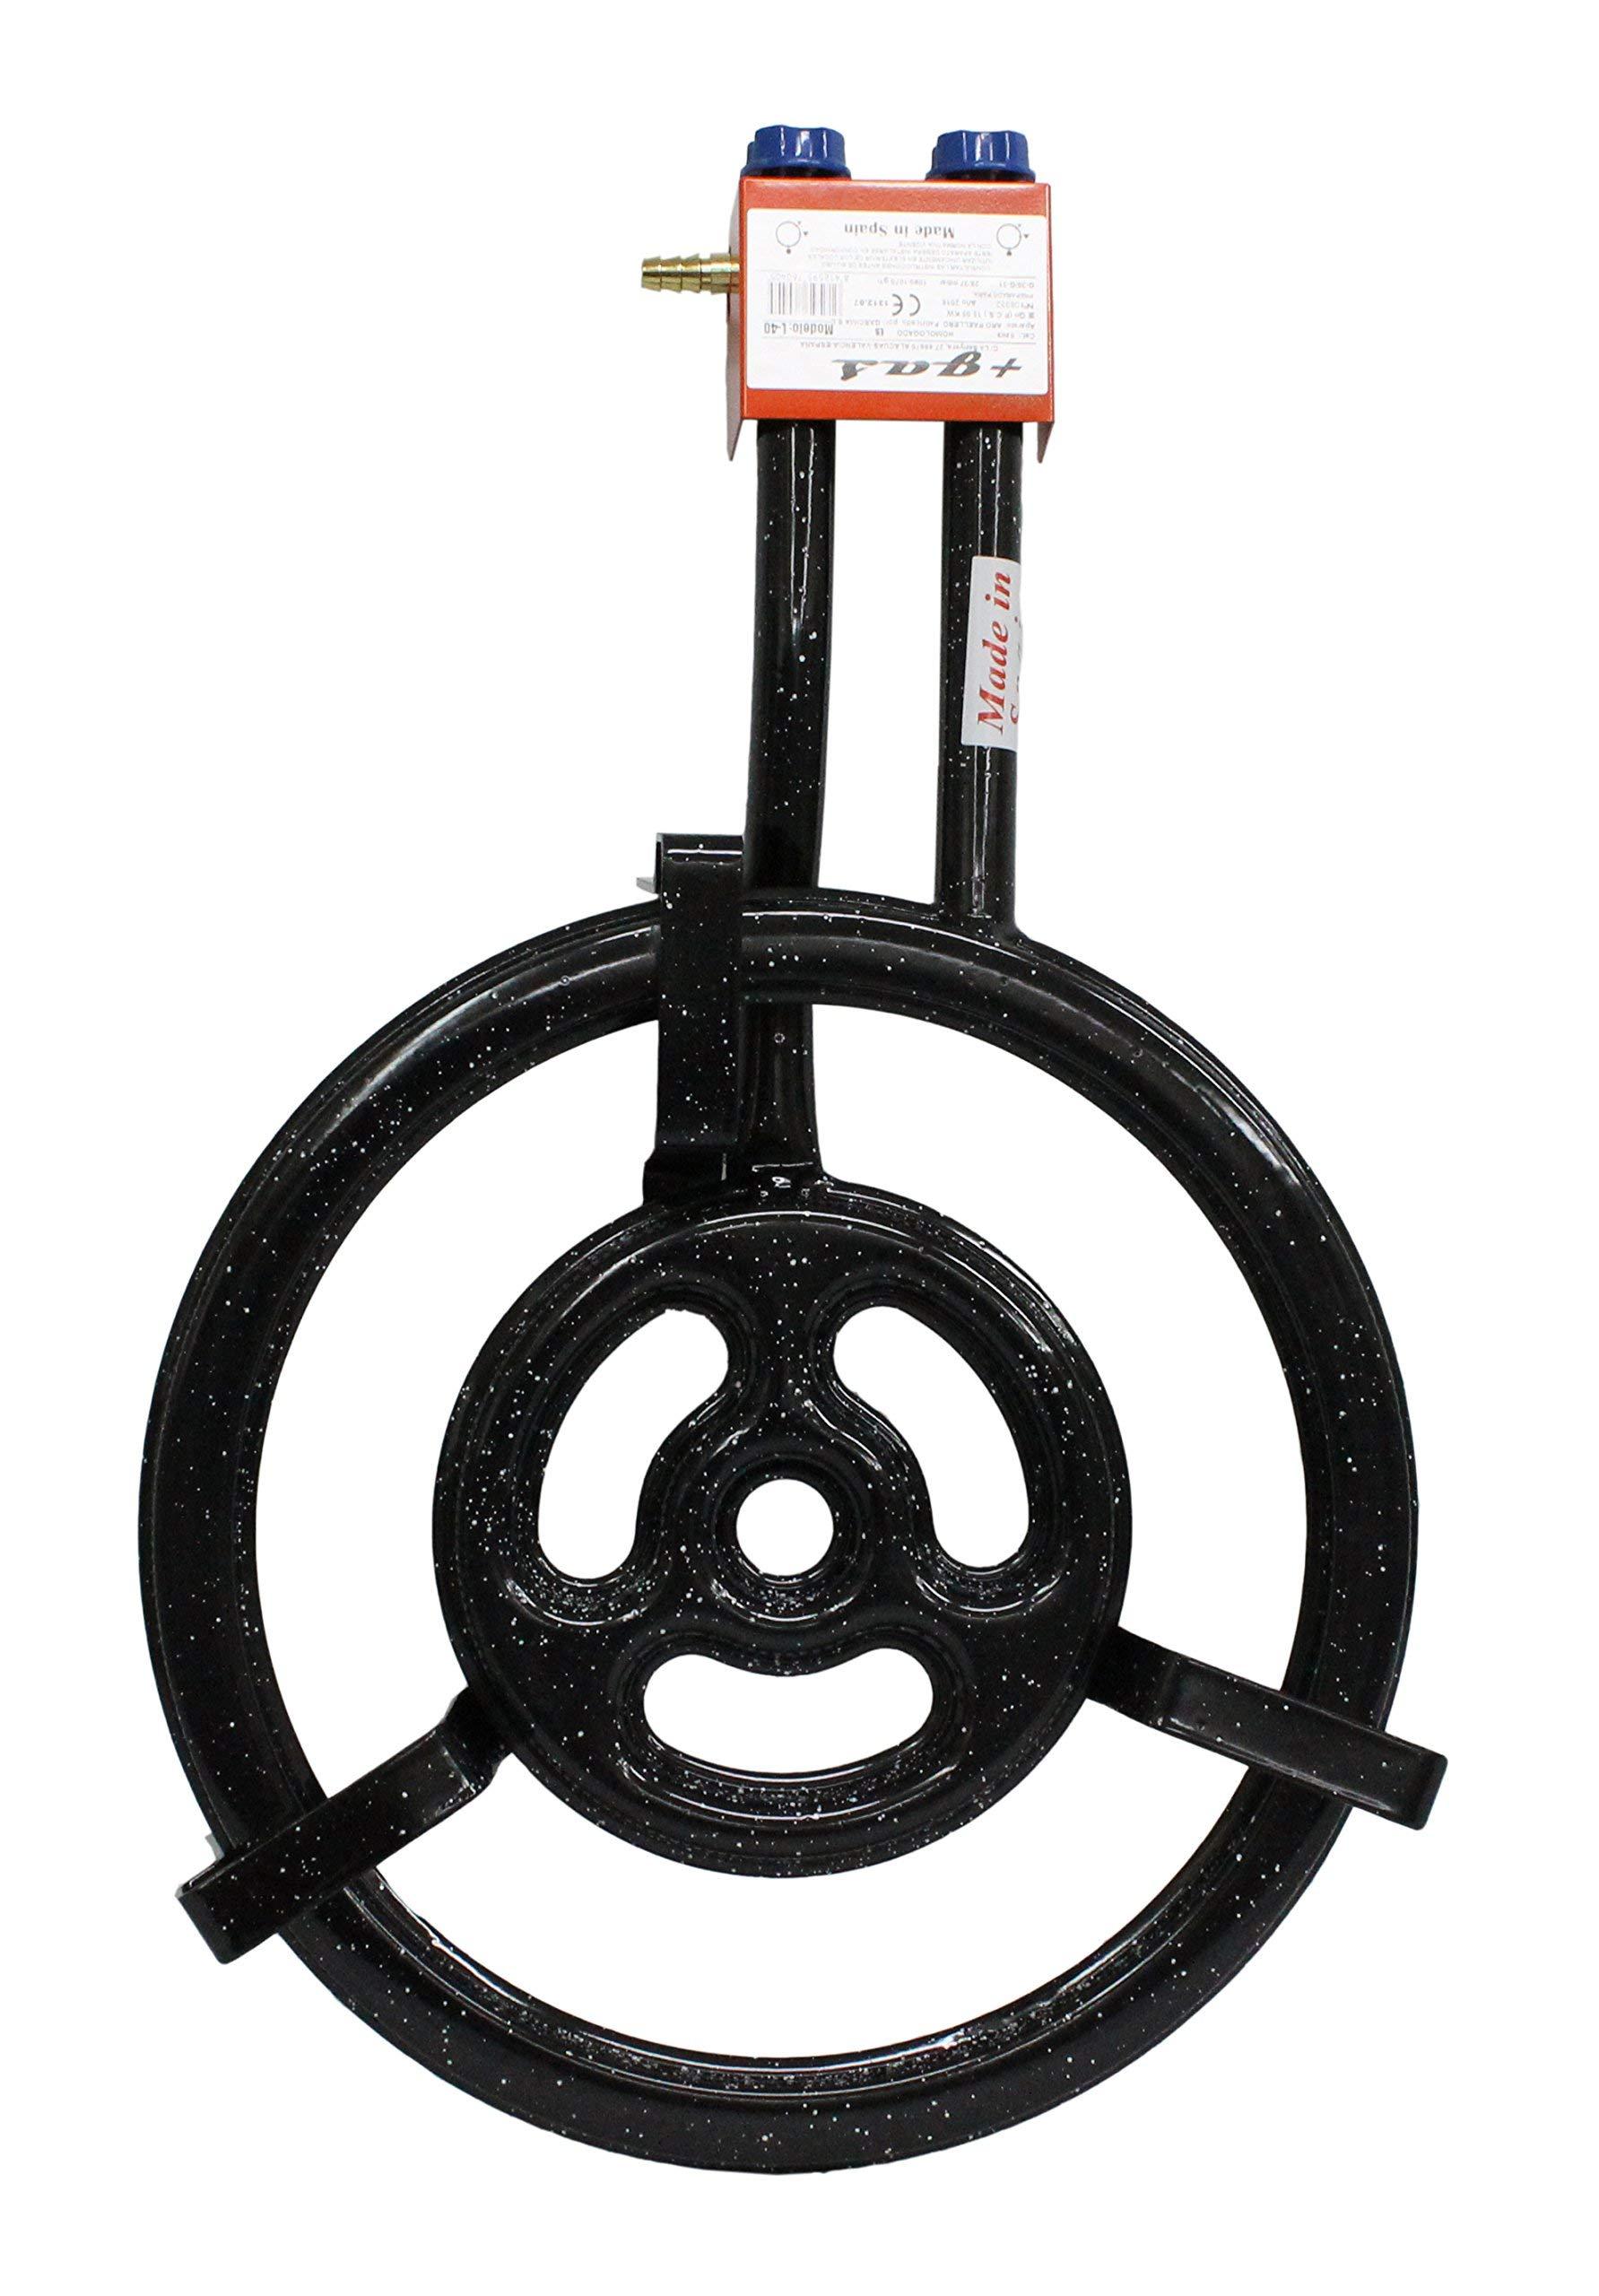 Garcima 76050 Hornillo paellero Gas Plano l-50 2 Fuegos, Negro, 51.00×75.50×12.00 cm